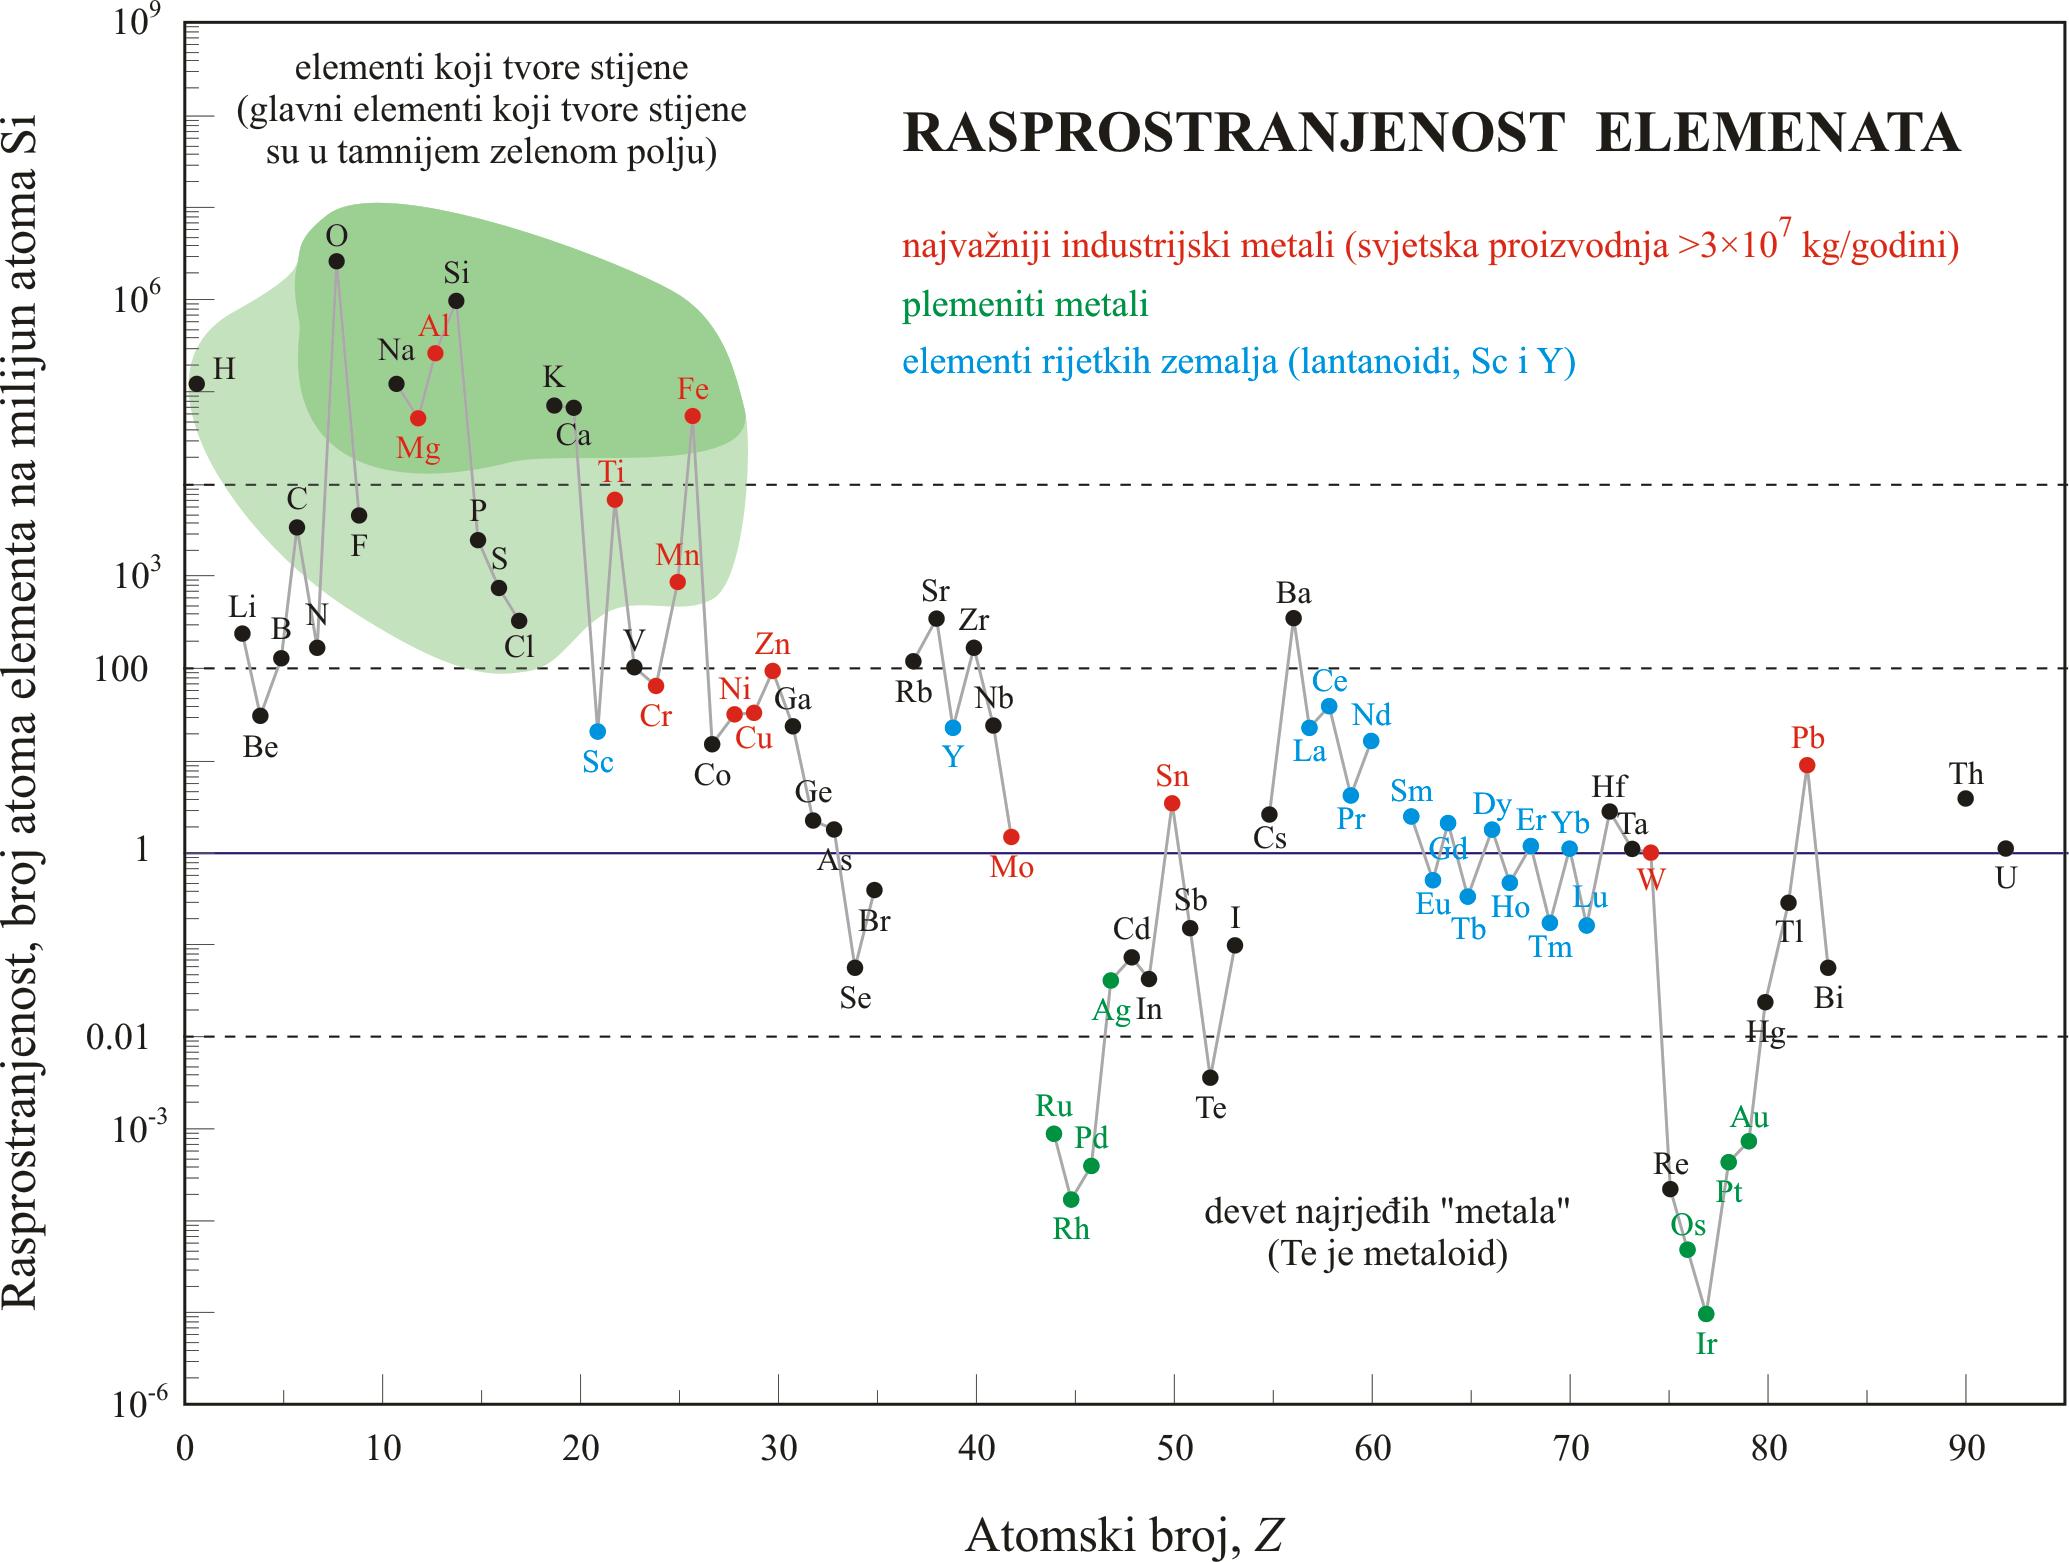 Relativna rasprostranjenost kemijskih elemenata